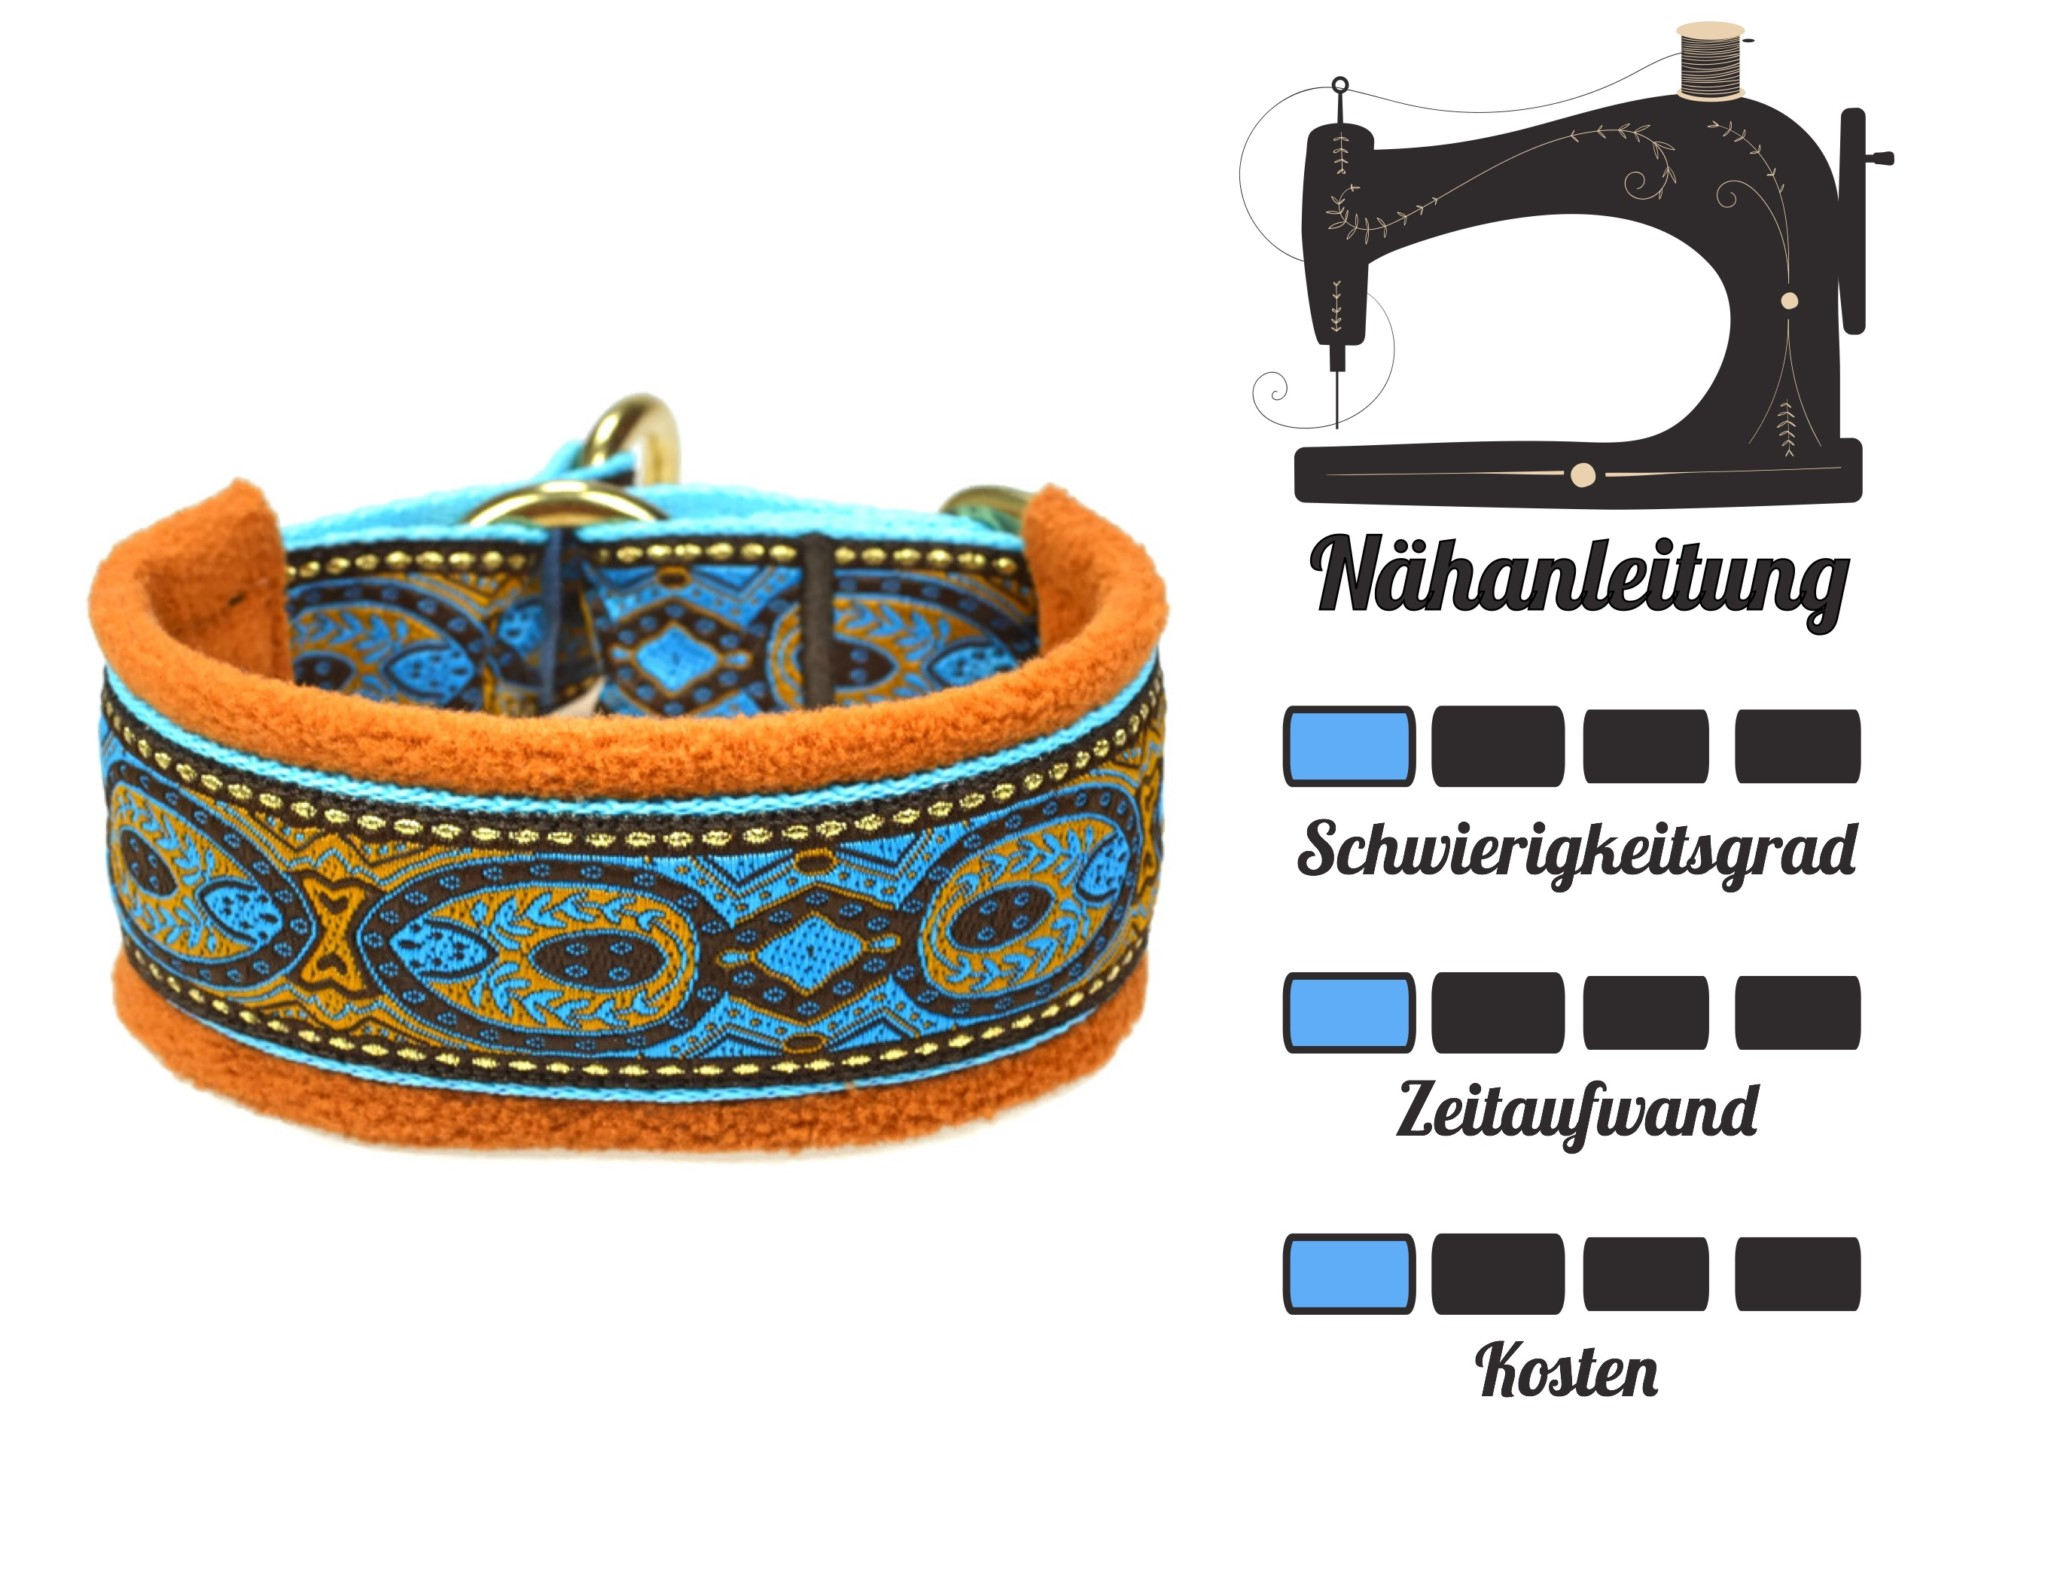 DIY für Hunde - Halsband Zugstopp Nähanleitung